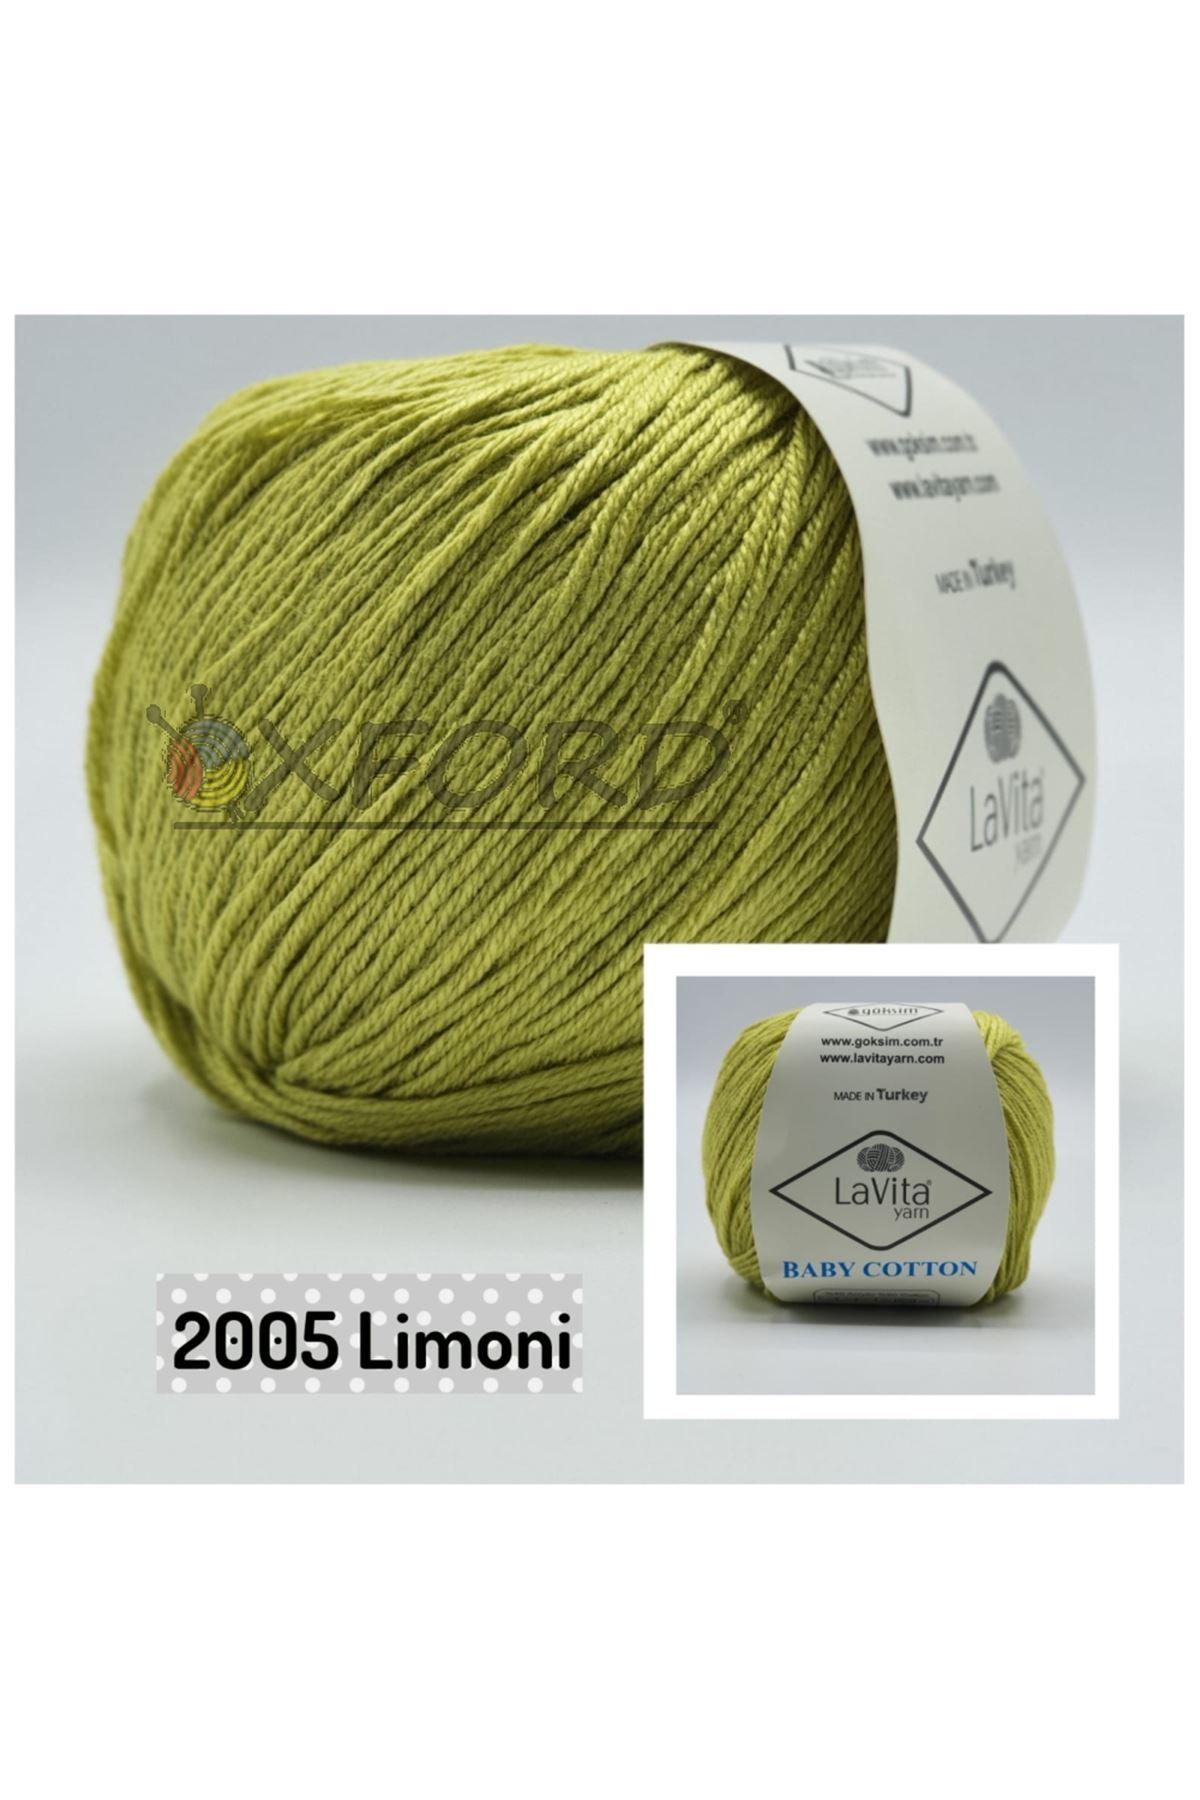 Lavita Baby Cotton 2005 Limoni